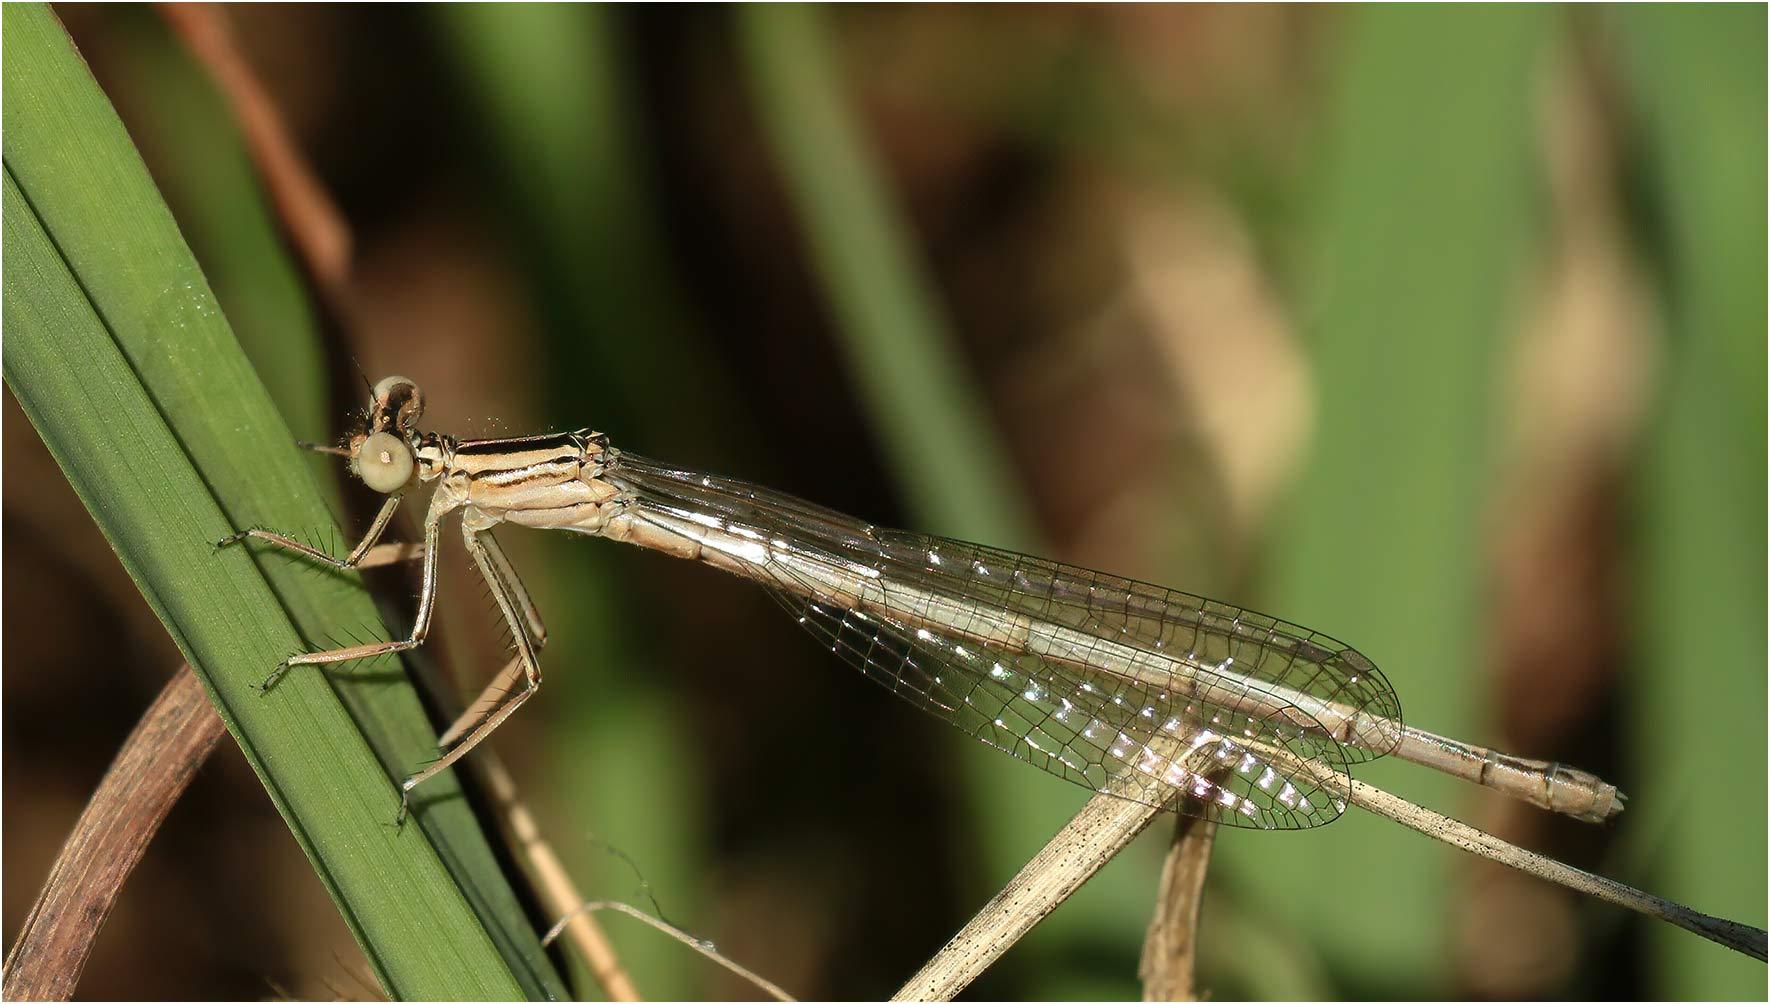 Platycnemis latipes femelle émergente, Sort-en-Chalosse (France-40), 06/07/2020